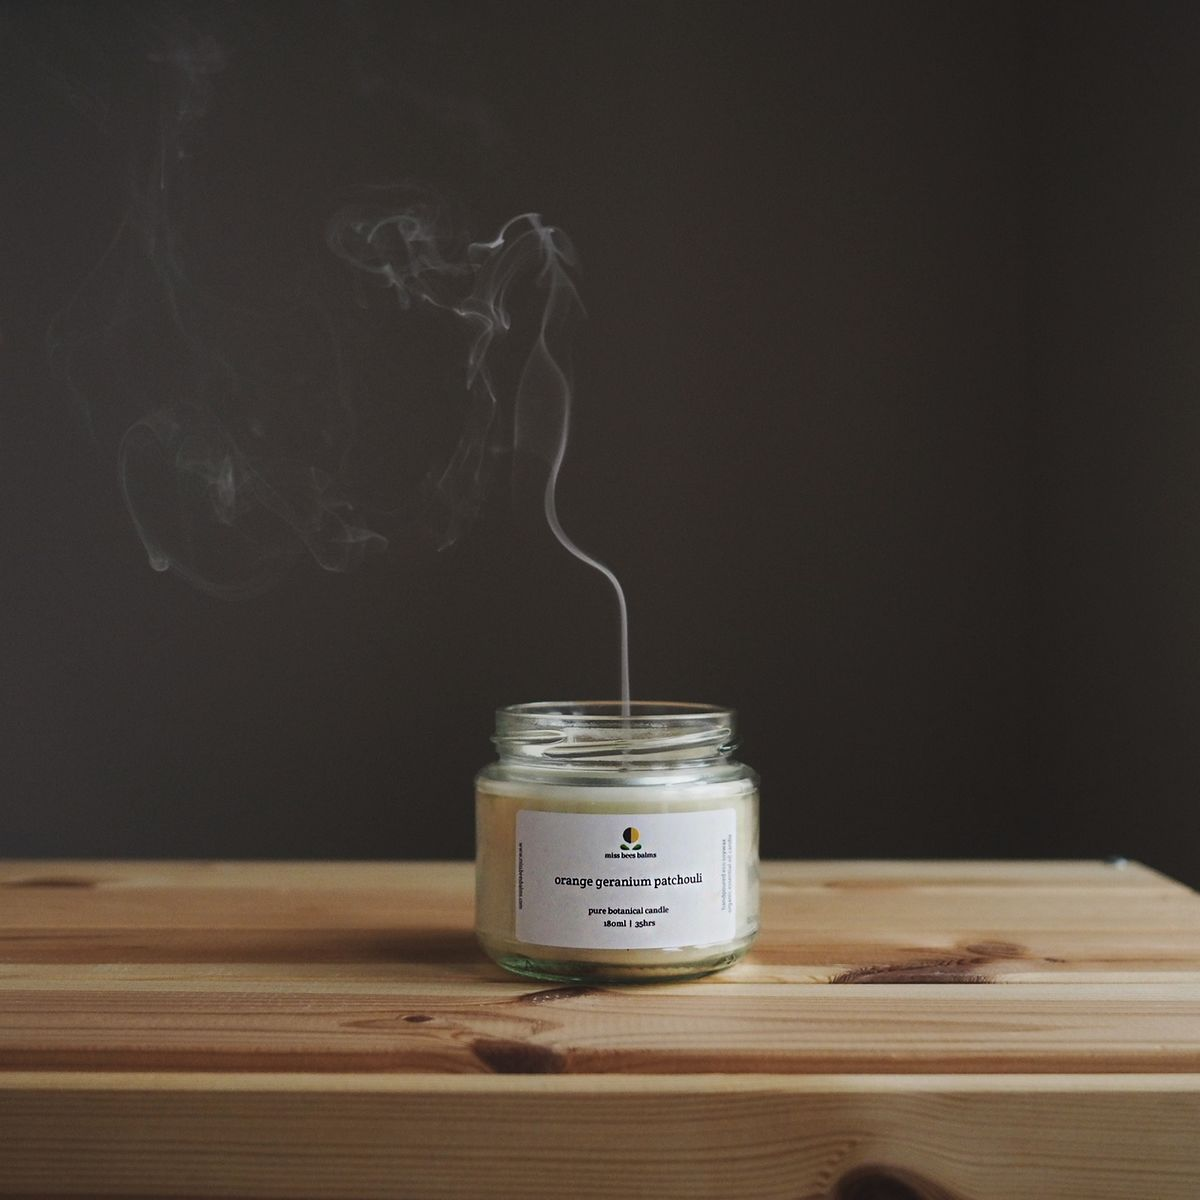 miss_bees_balms_orange_geranium_patchouli_eco_soy_wax_candle_balancing_aromatherapy_candle_massive.jpg